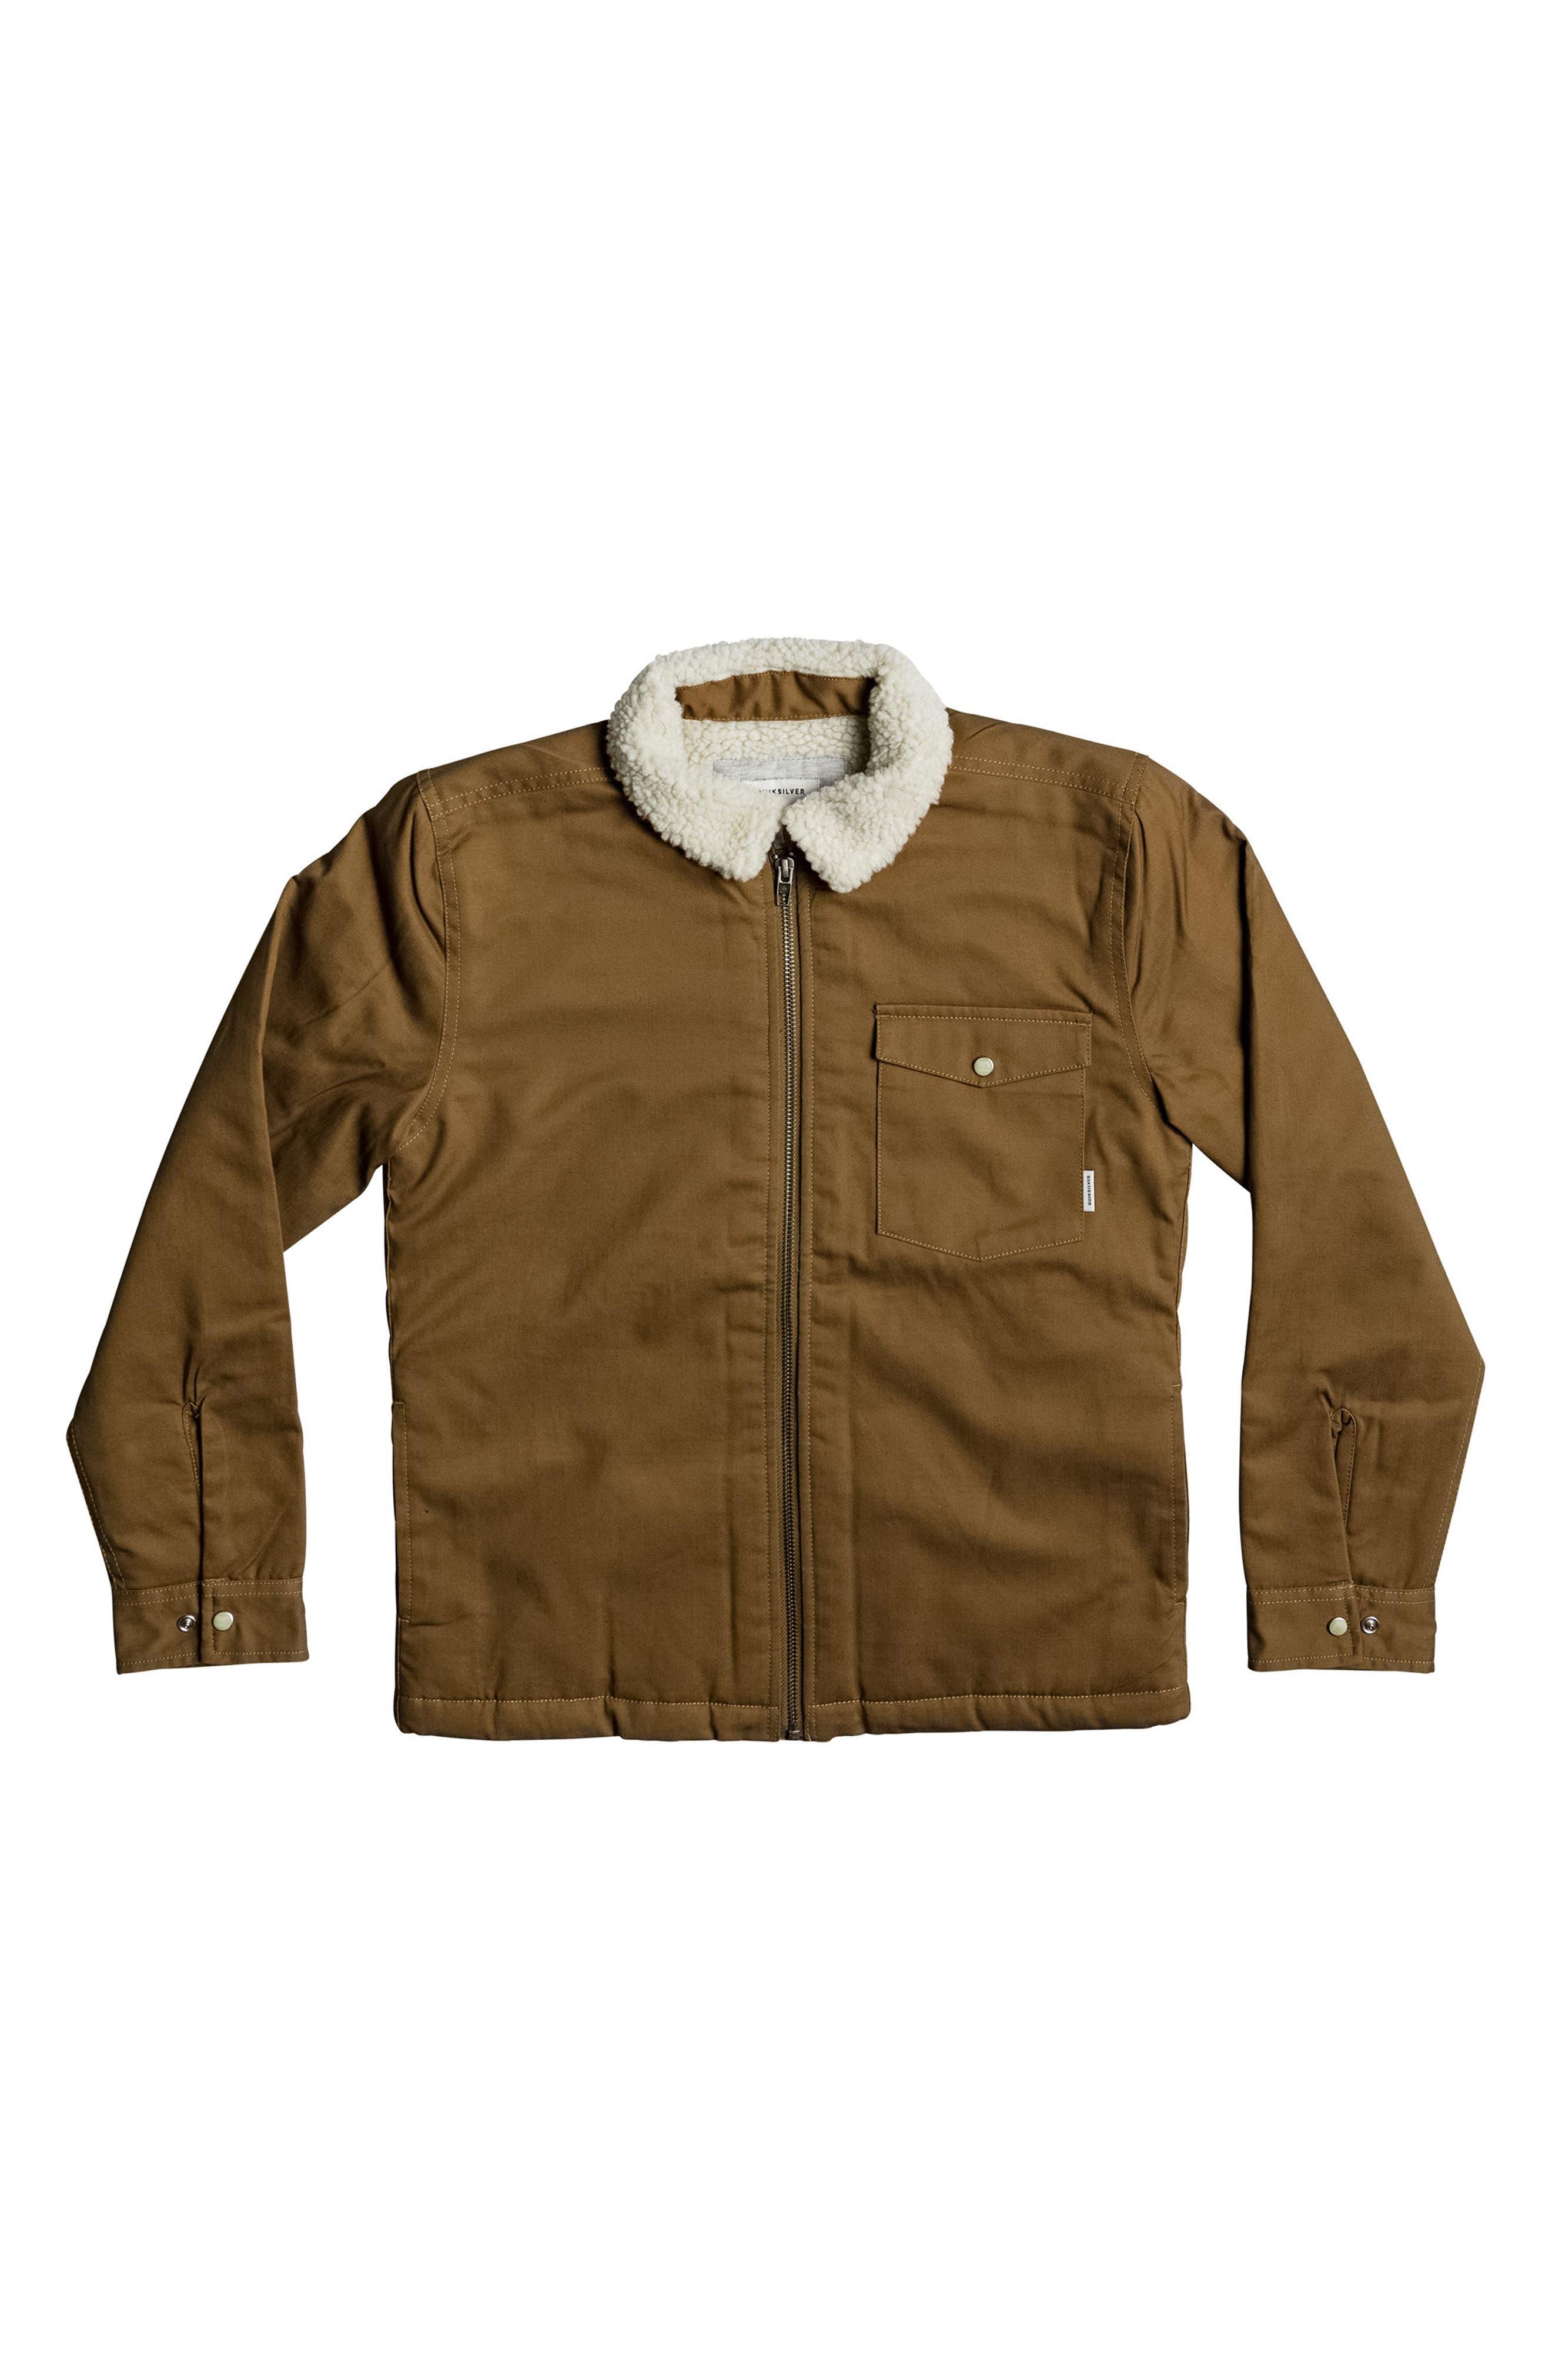 Dabein Fleece Lined Jacket,                         Main,                         color,